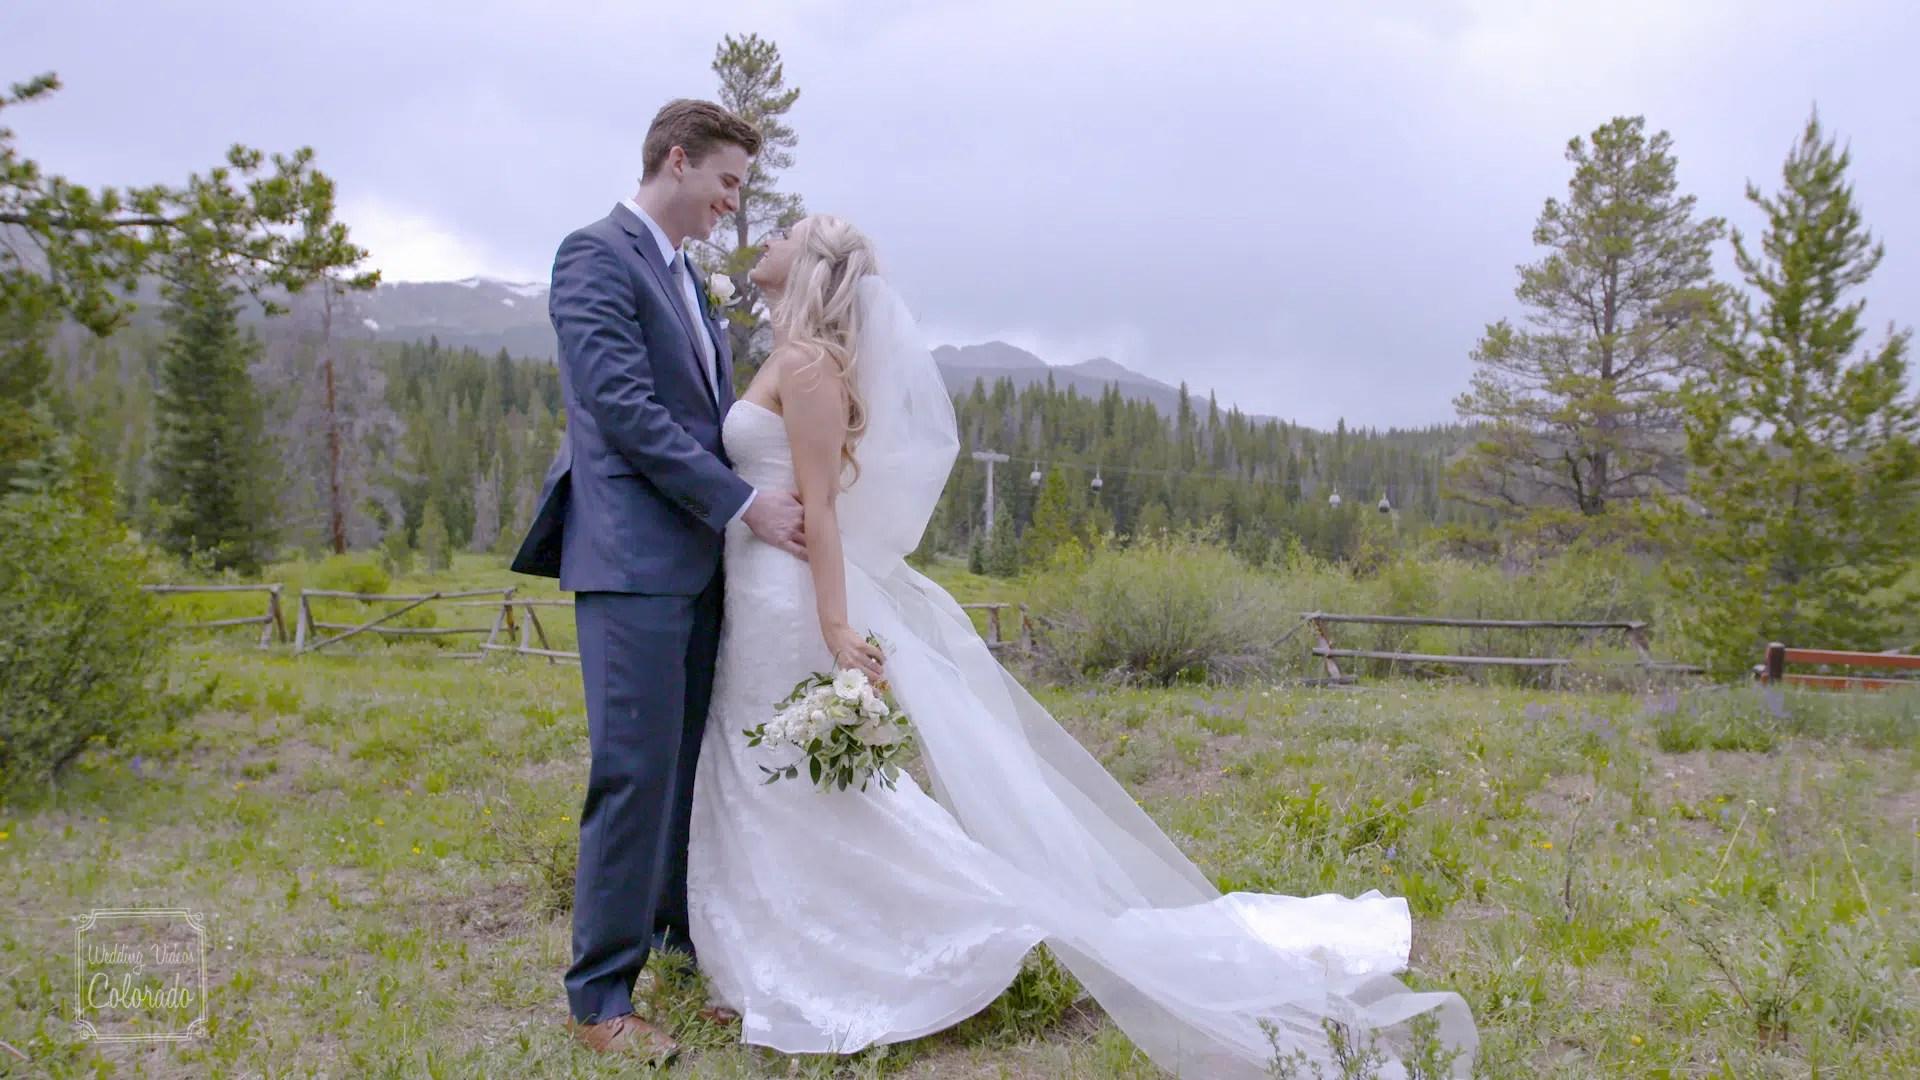 David Taylor Breckenridge nordic center Wedding Still 2018